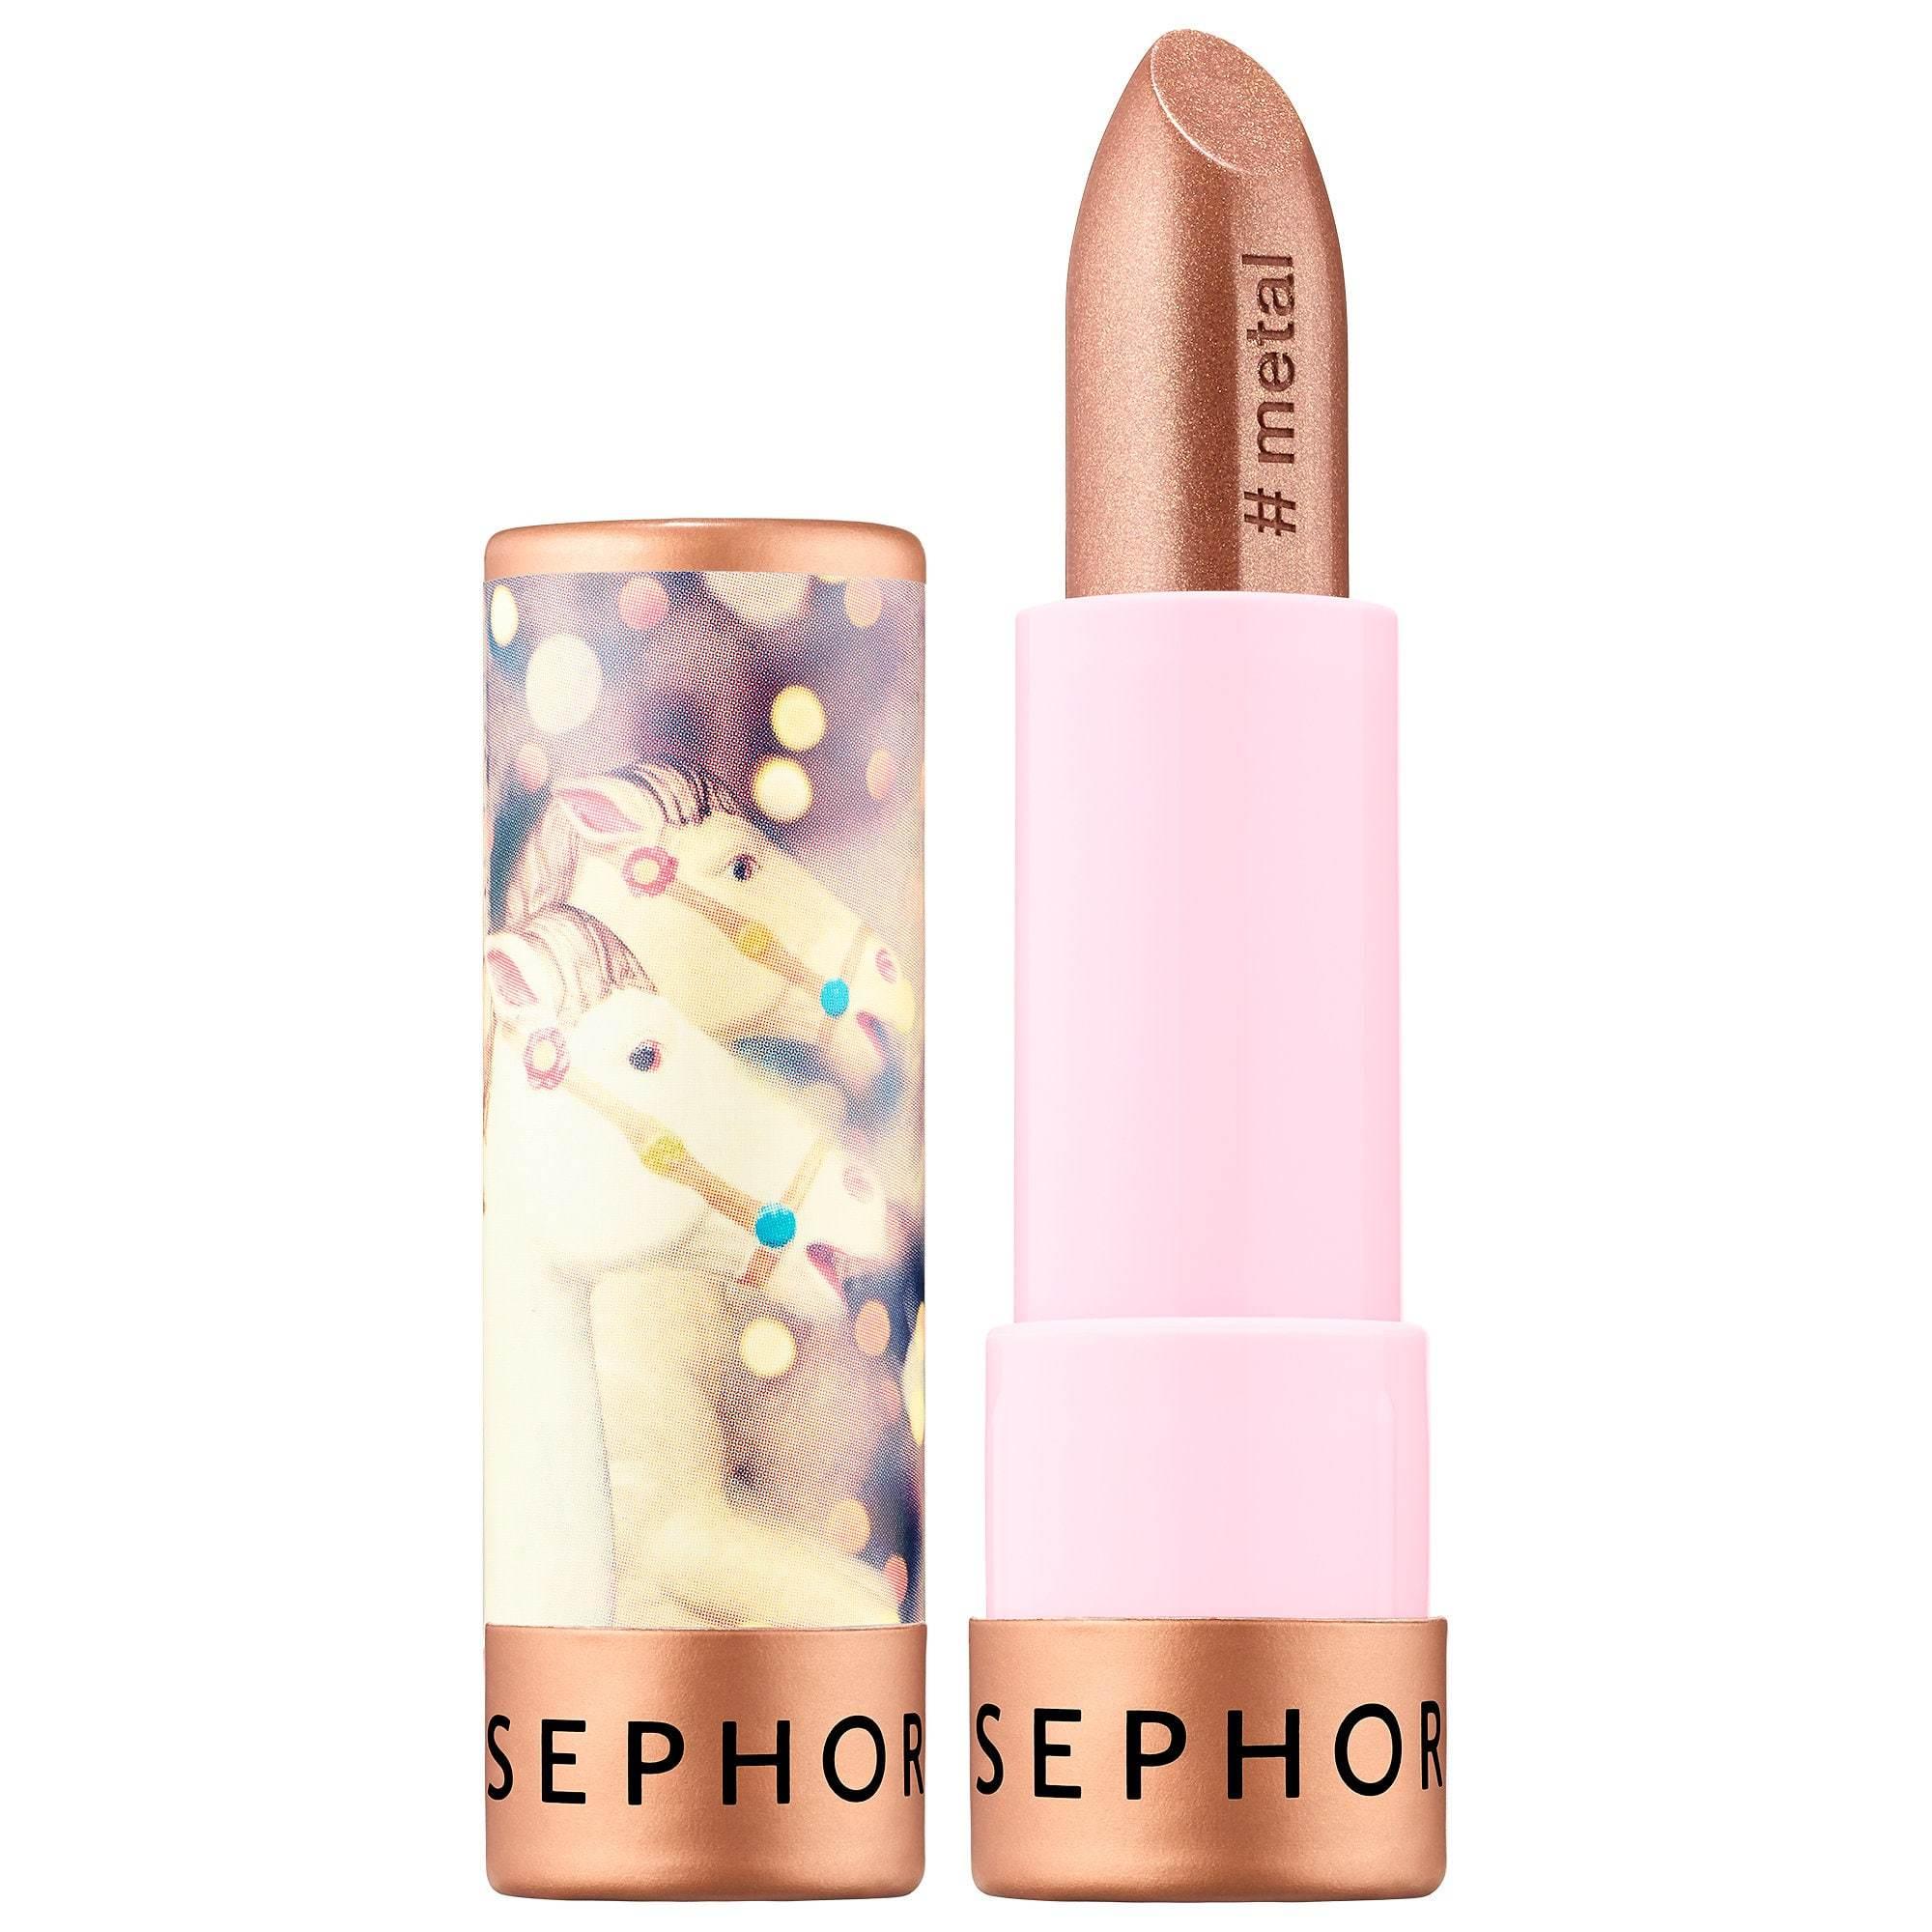 Sephora #Lipstories Lipstick Take A Spin 41